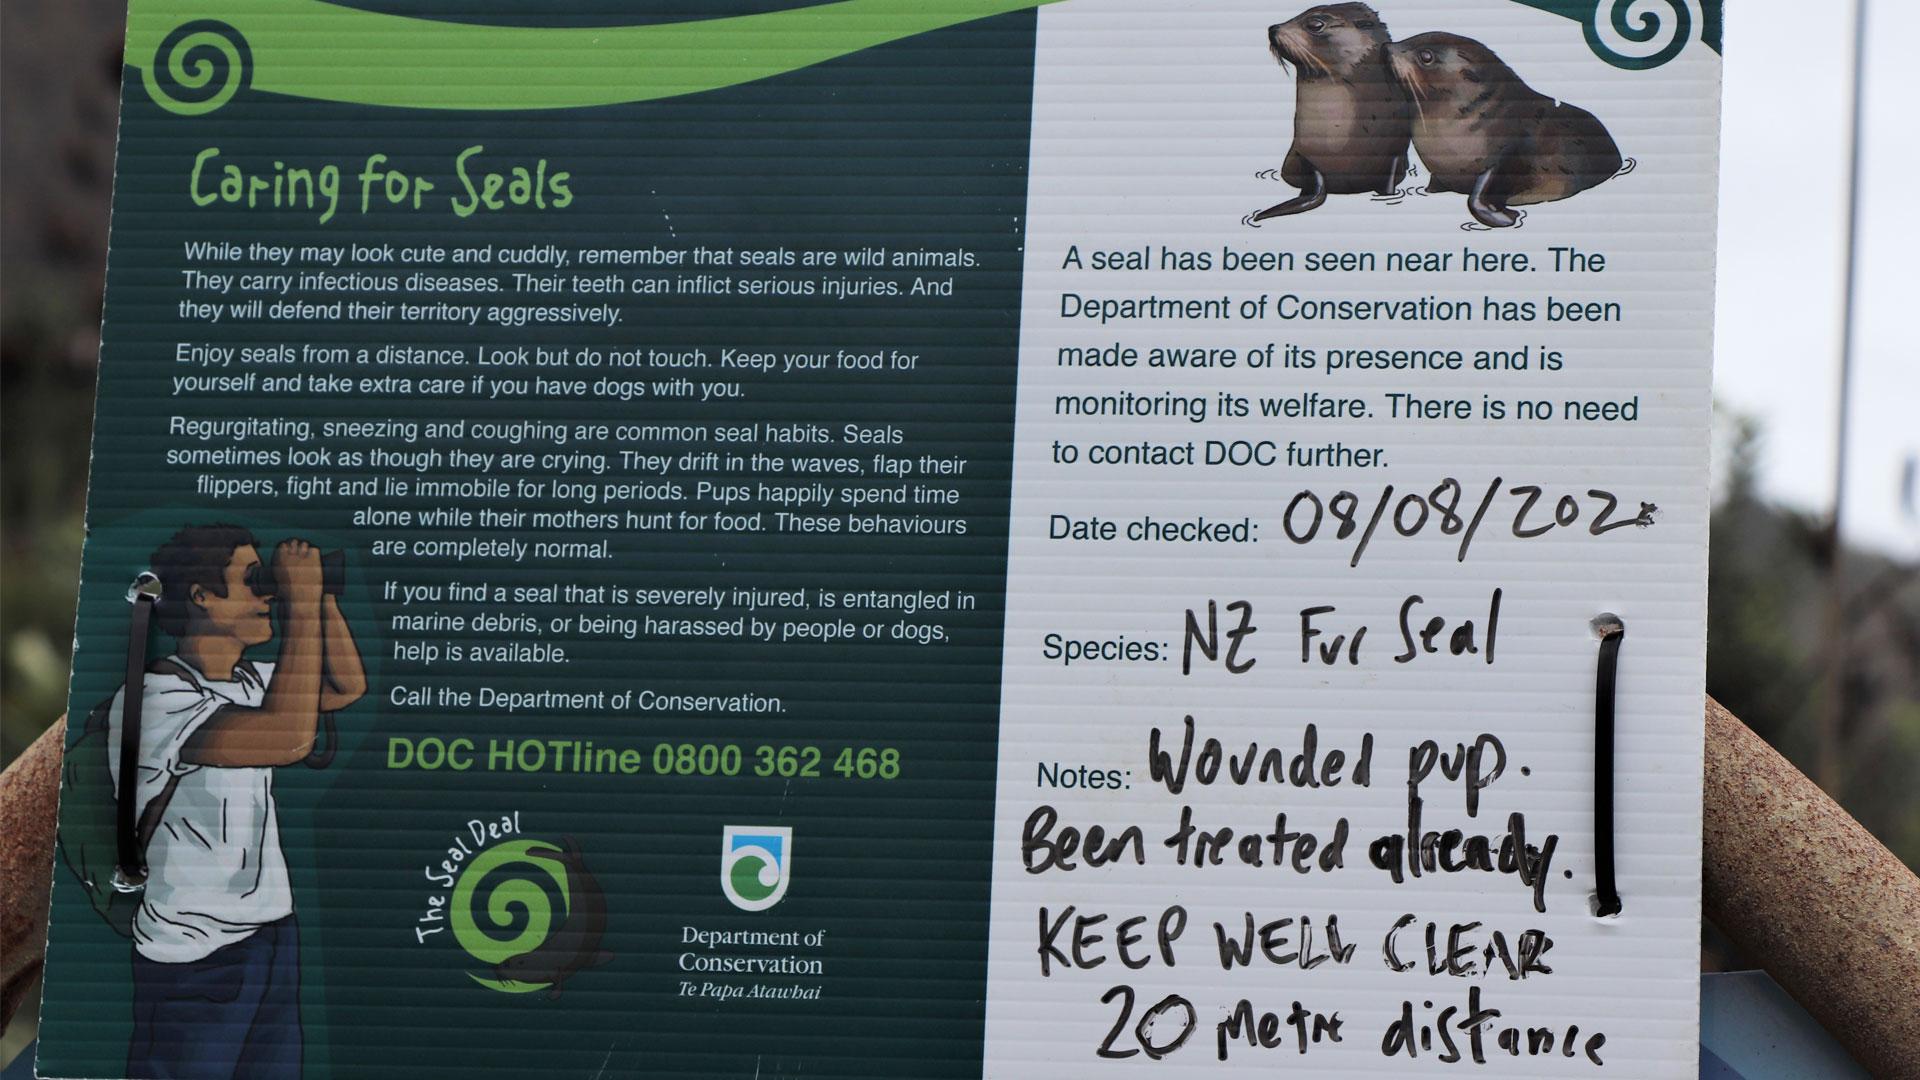 https://rfacdn.nz/zoo/assets/media/nz-fur-seal-gallery-9.jpg